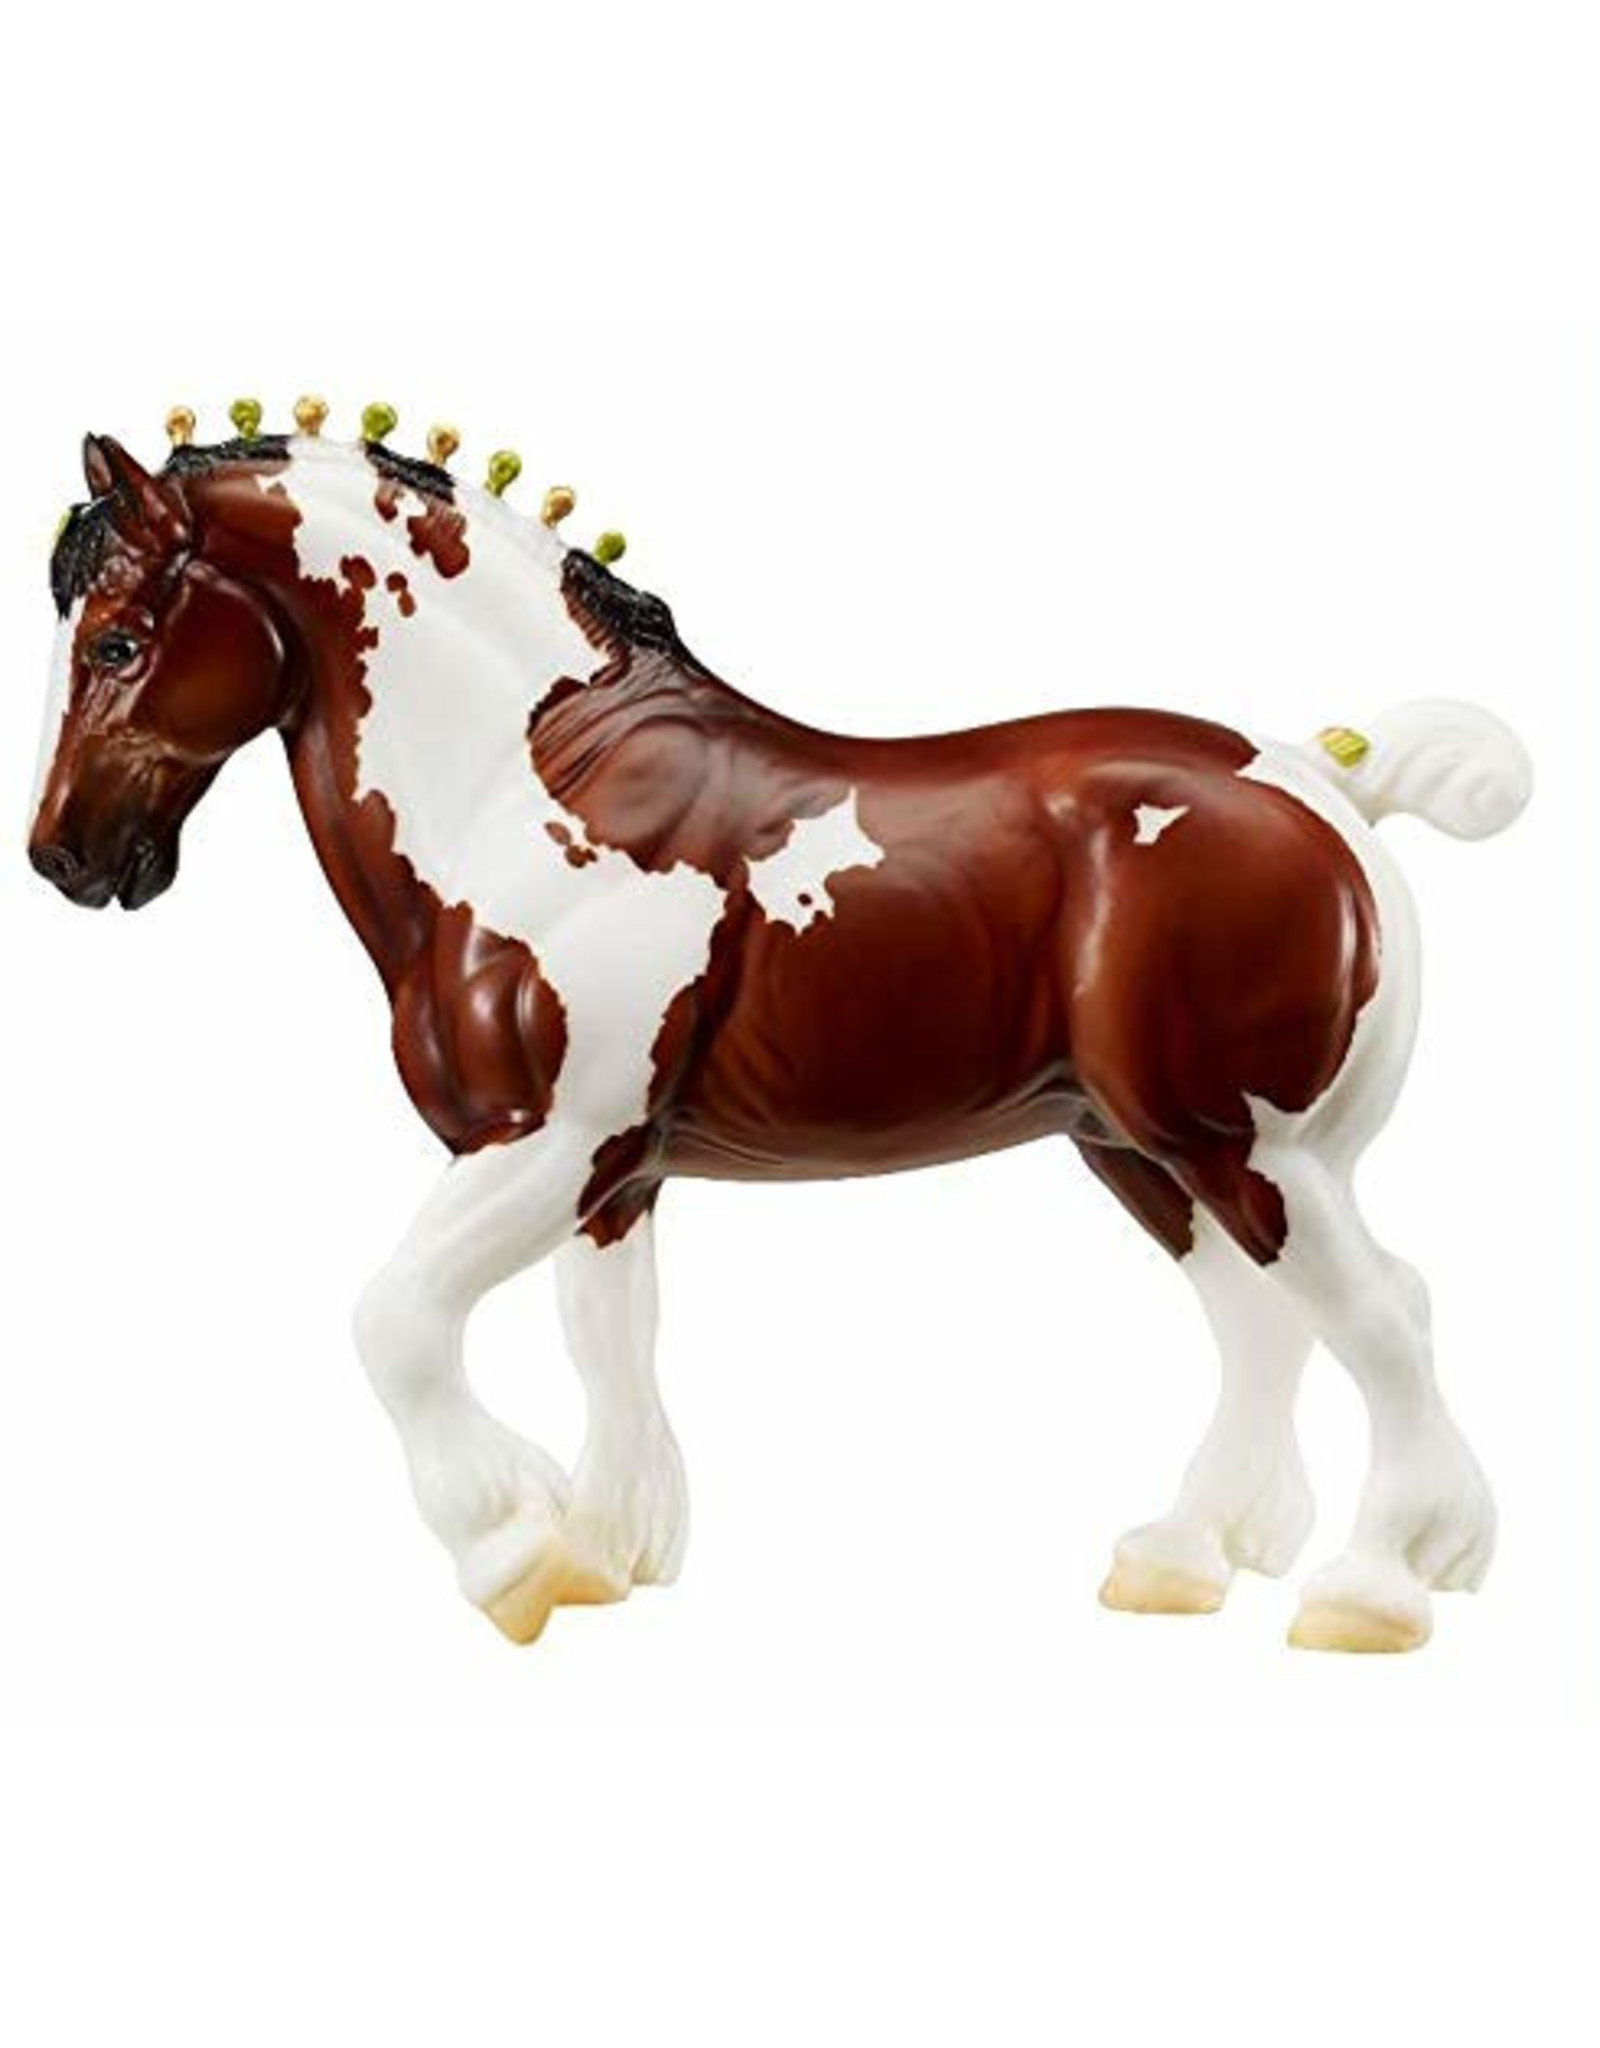 Breyer Seamus - 2019 Flagship Horse